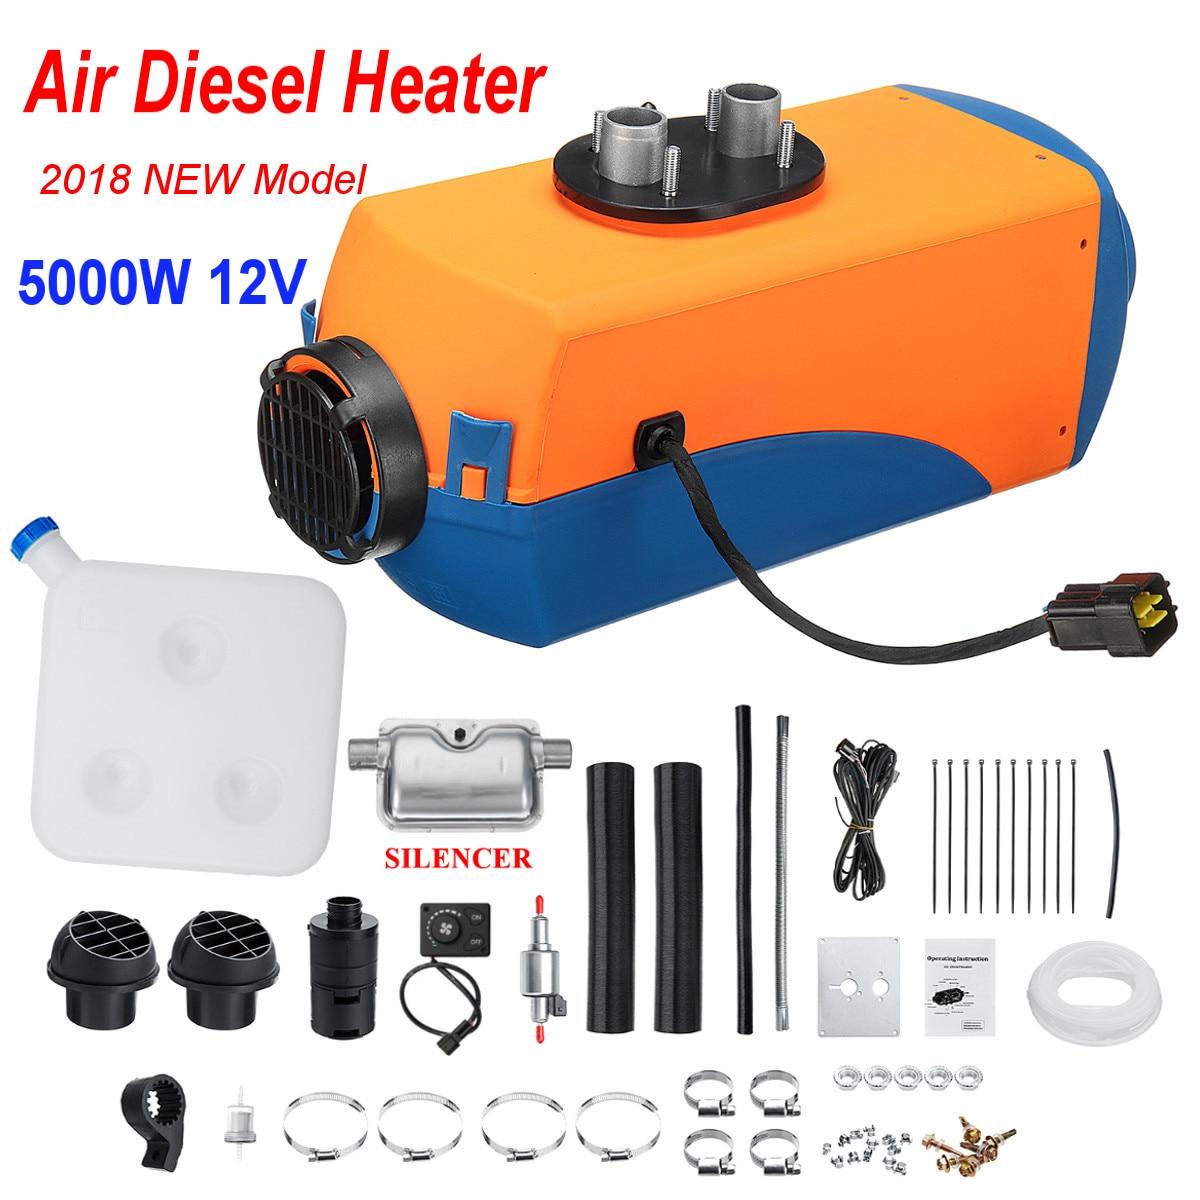 все цены на 5KW diesels Air Heater Planar 5000W 12V For Motorhome Trucks Boats Bus Knob Switch with 1xSilencer онлайн